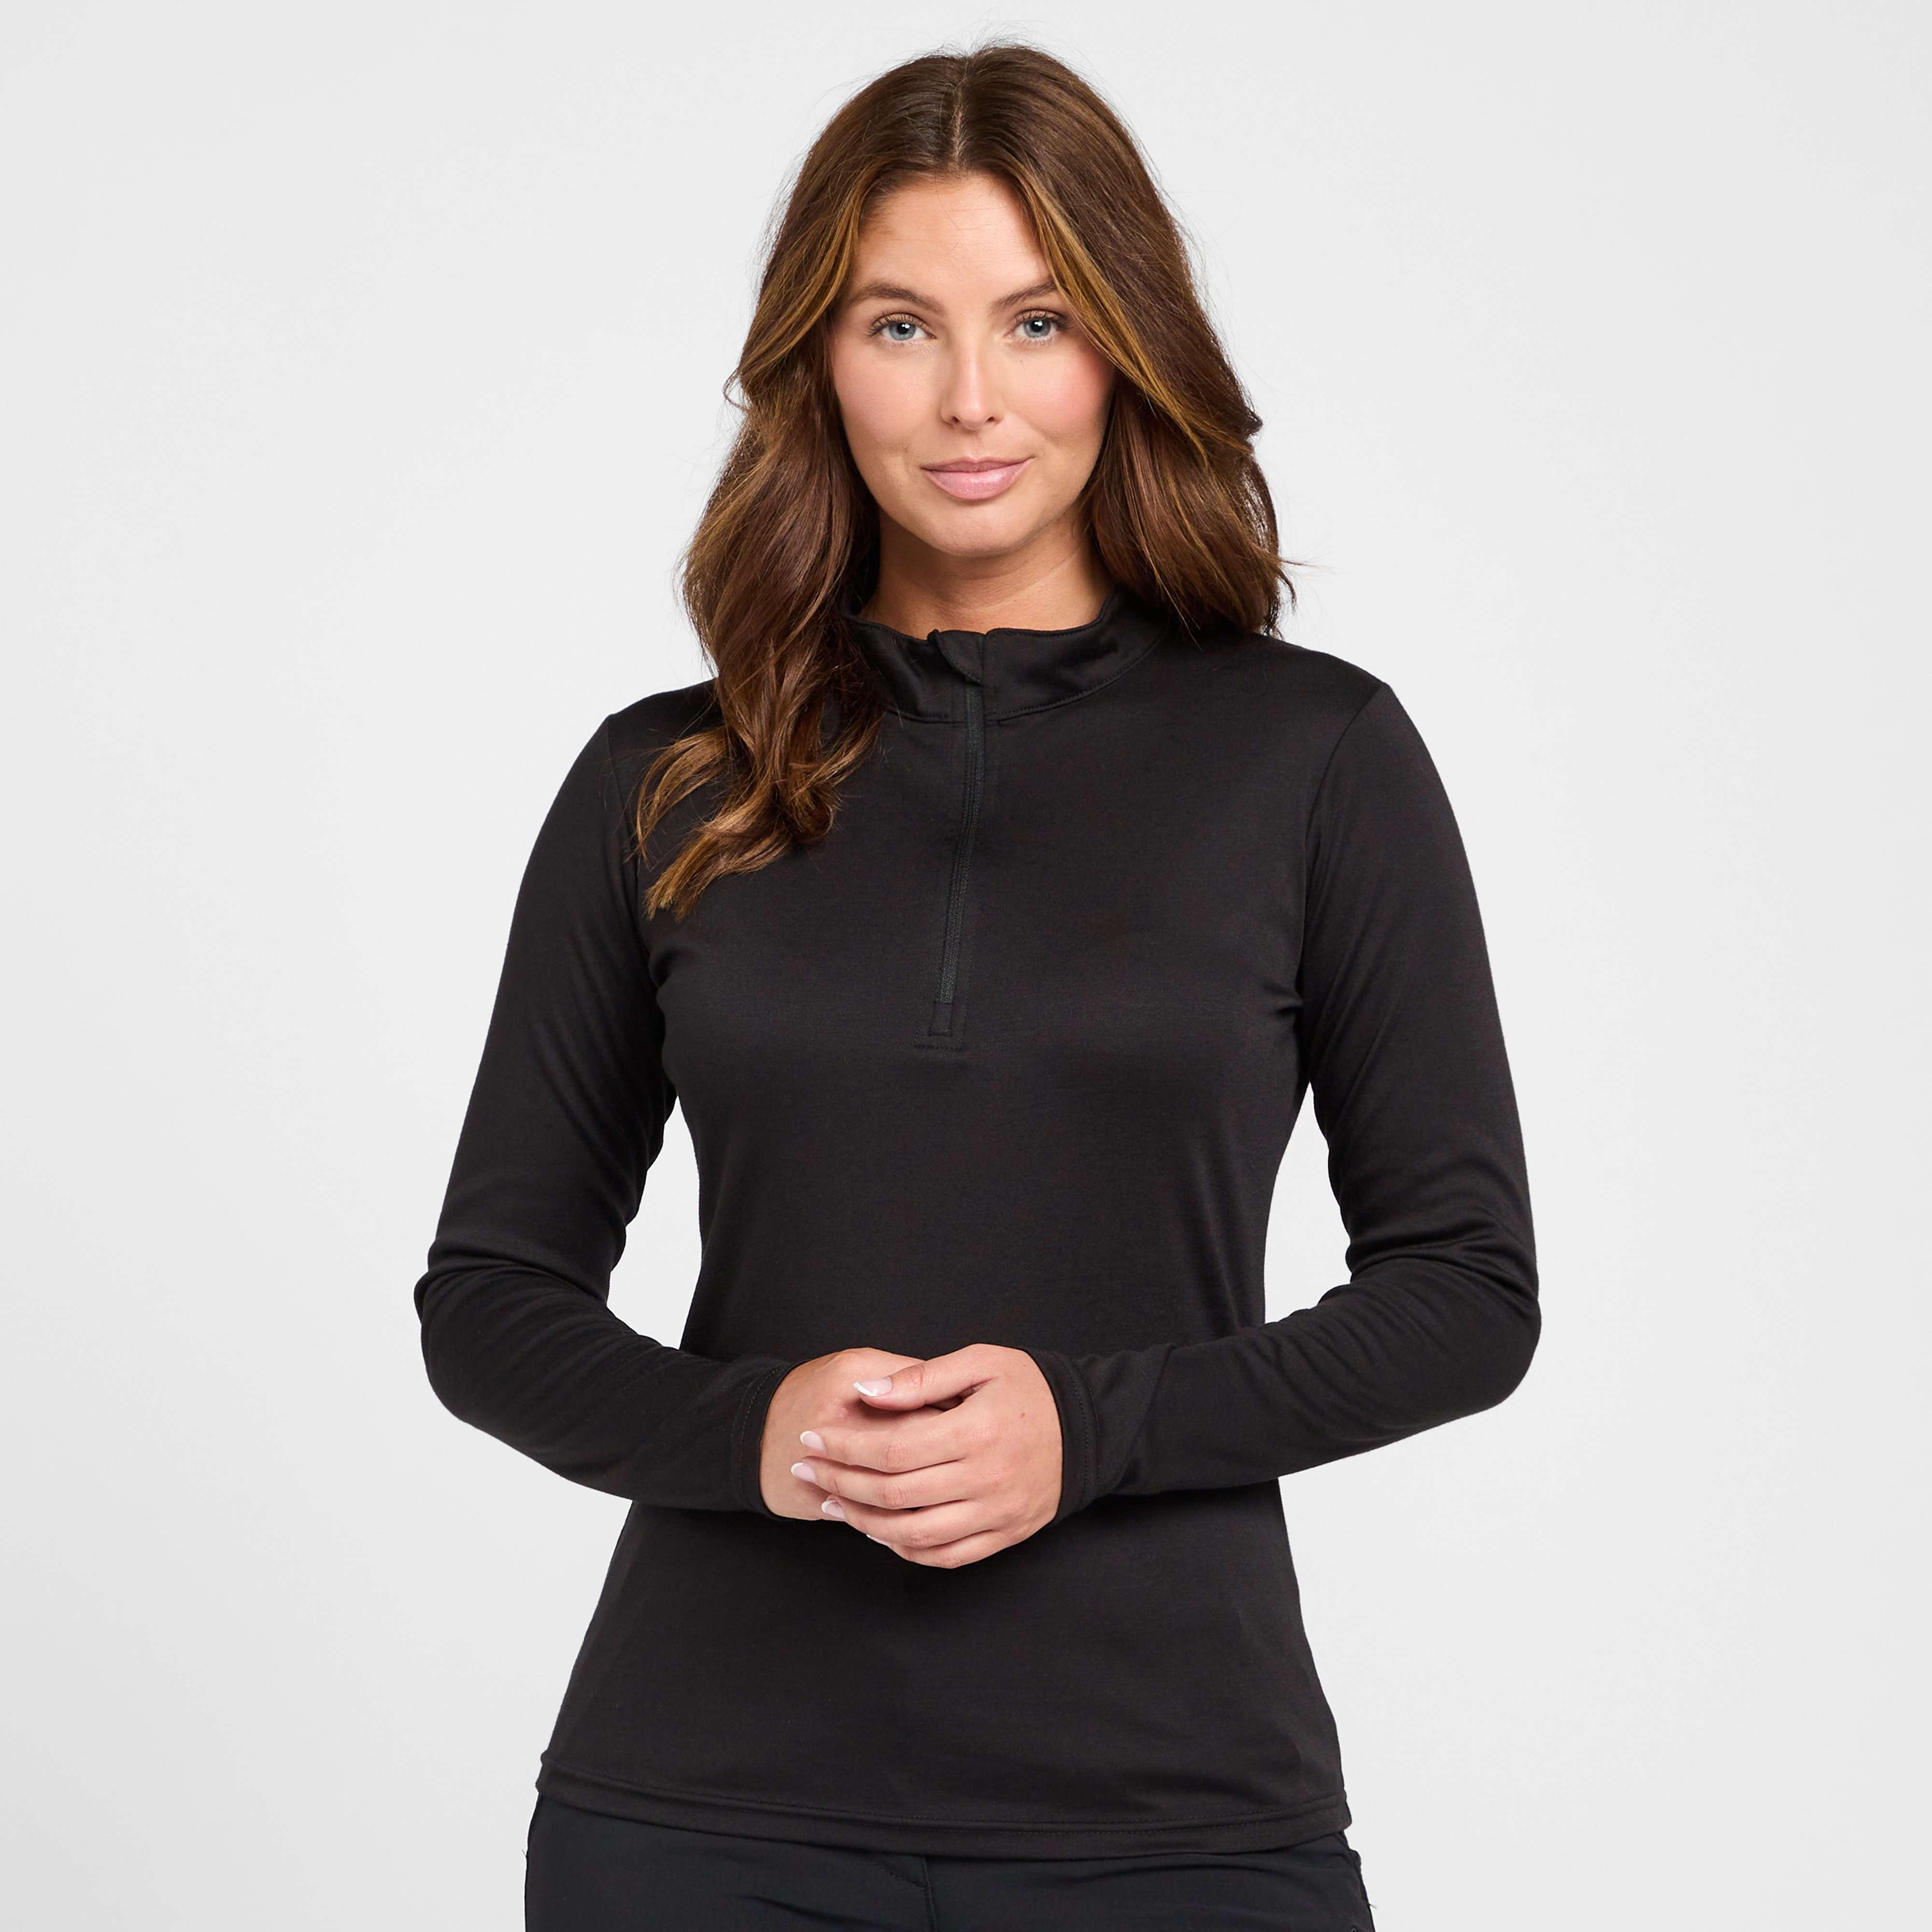 PETER STORM Women's Long Sleeve Thermal Zip Neck Baselayer